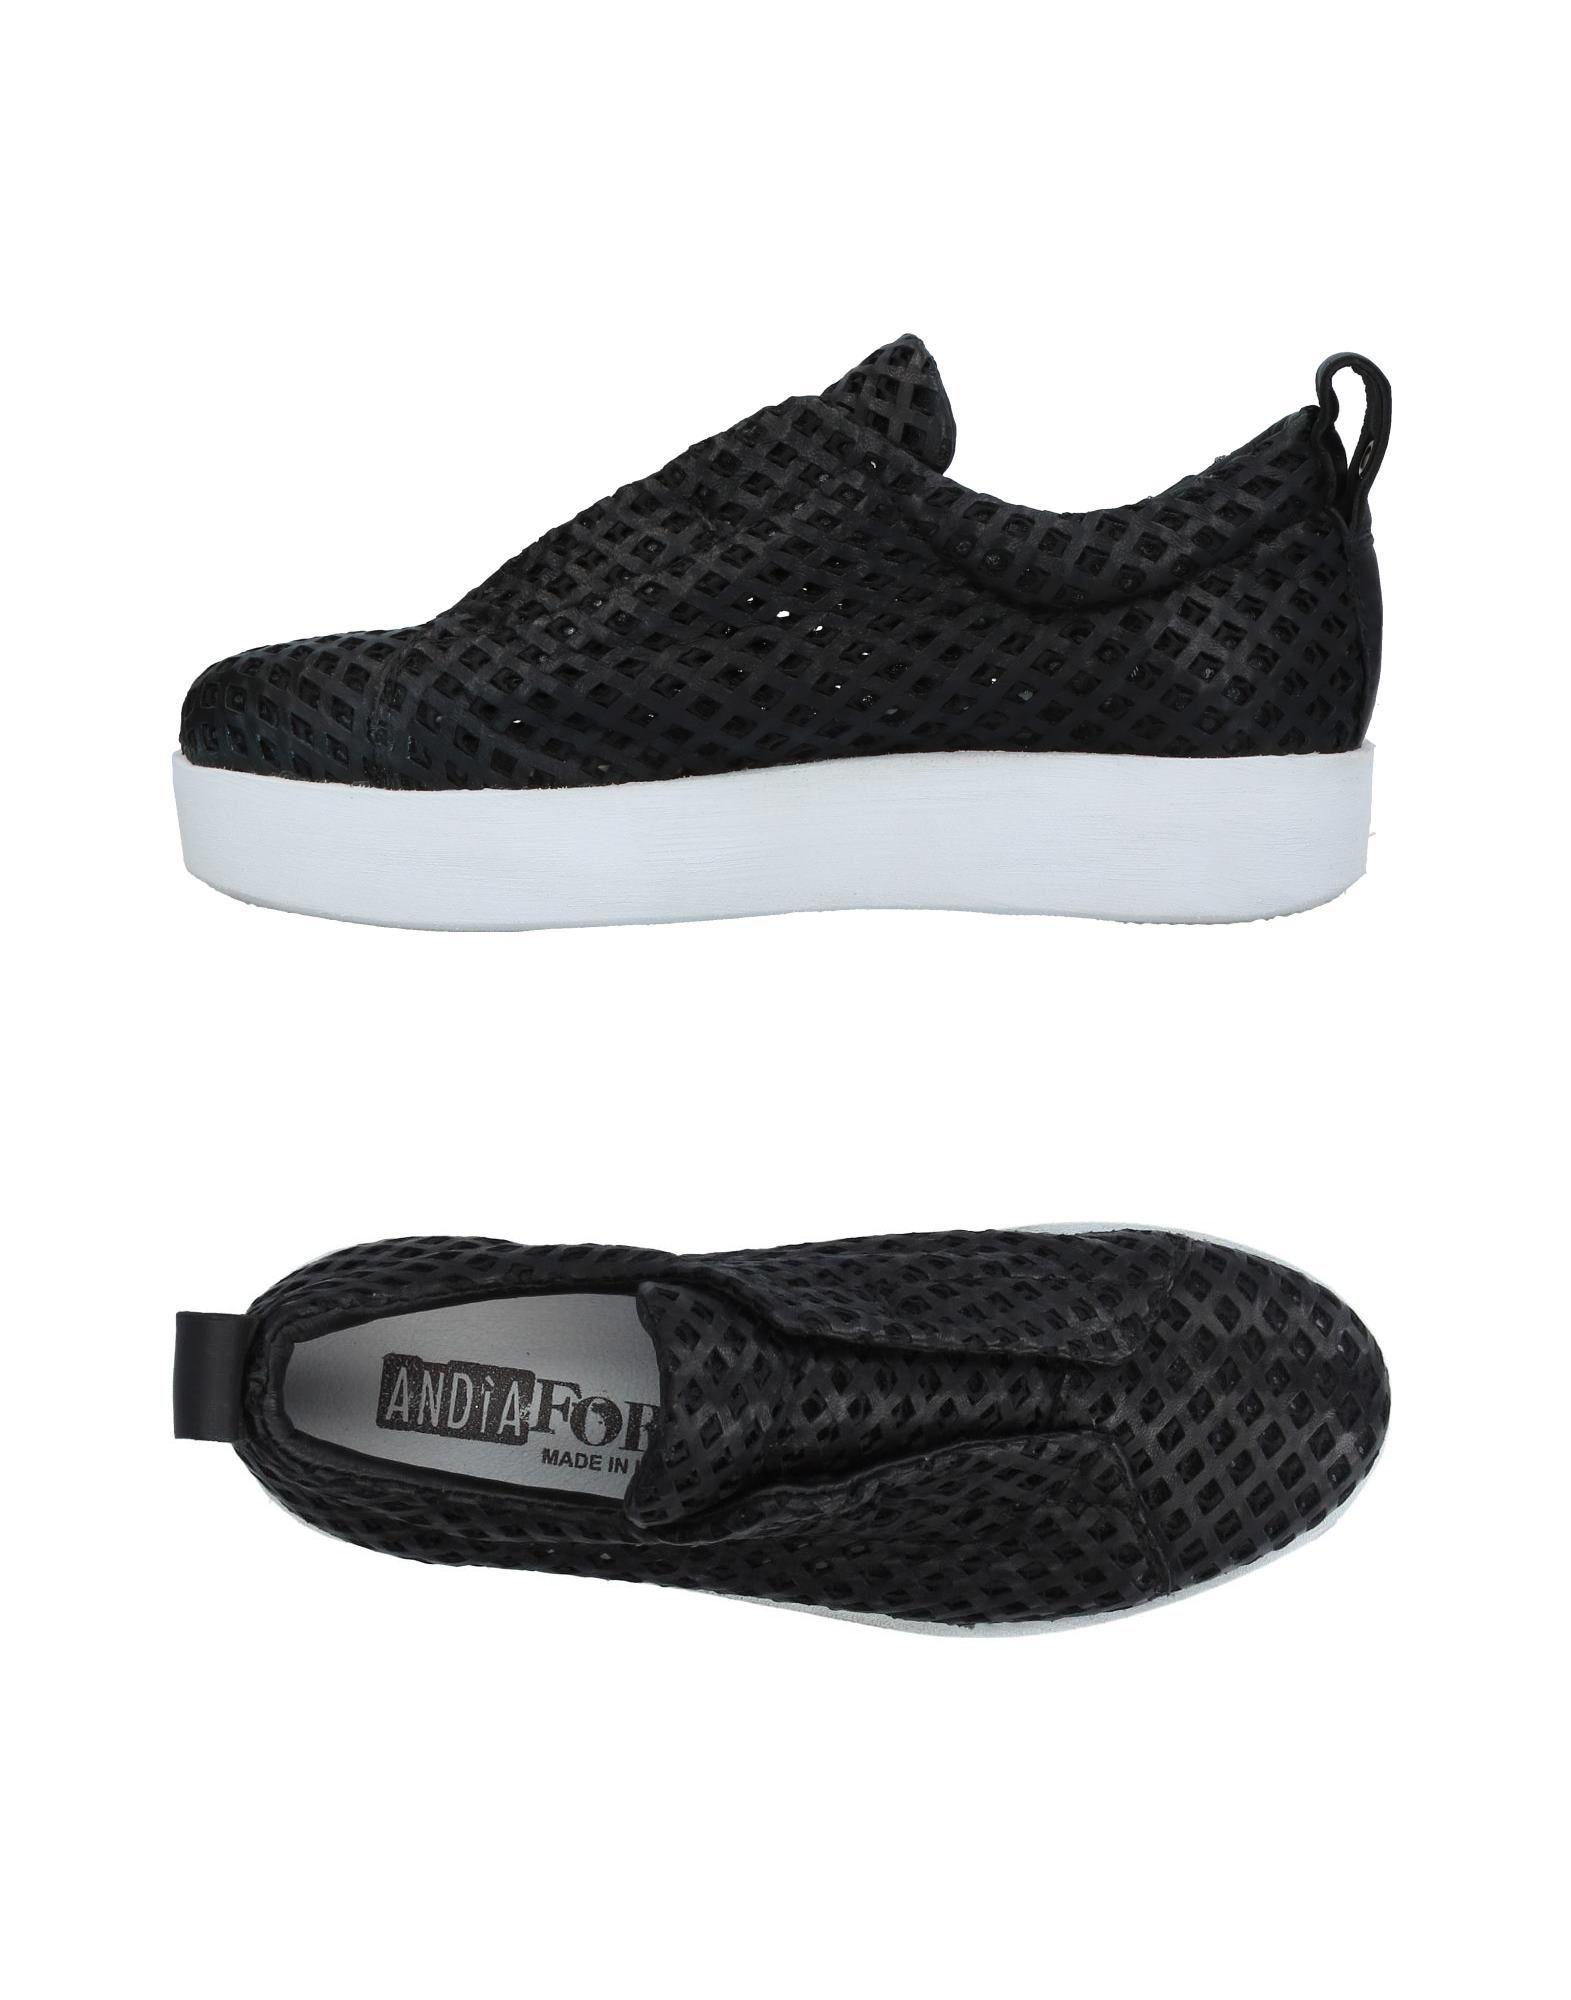 Andìa Fora Sneakers - Women 11376837OG Andìa Fora Sneakers online on  Australia - 11376837OG Women 4d83ee